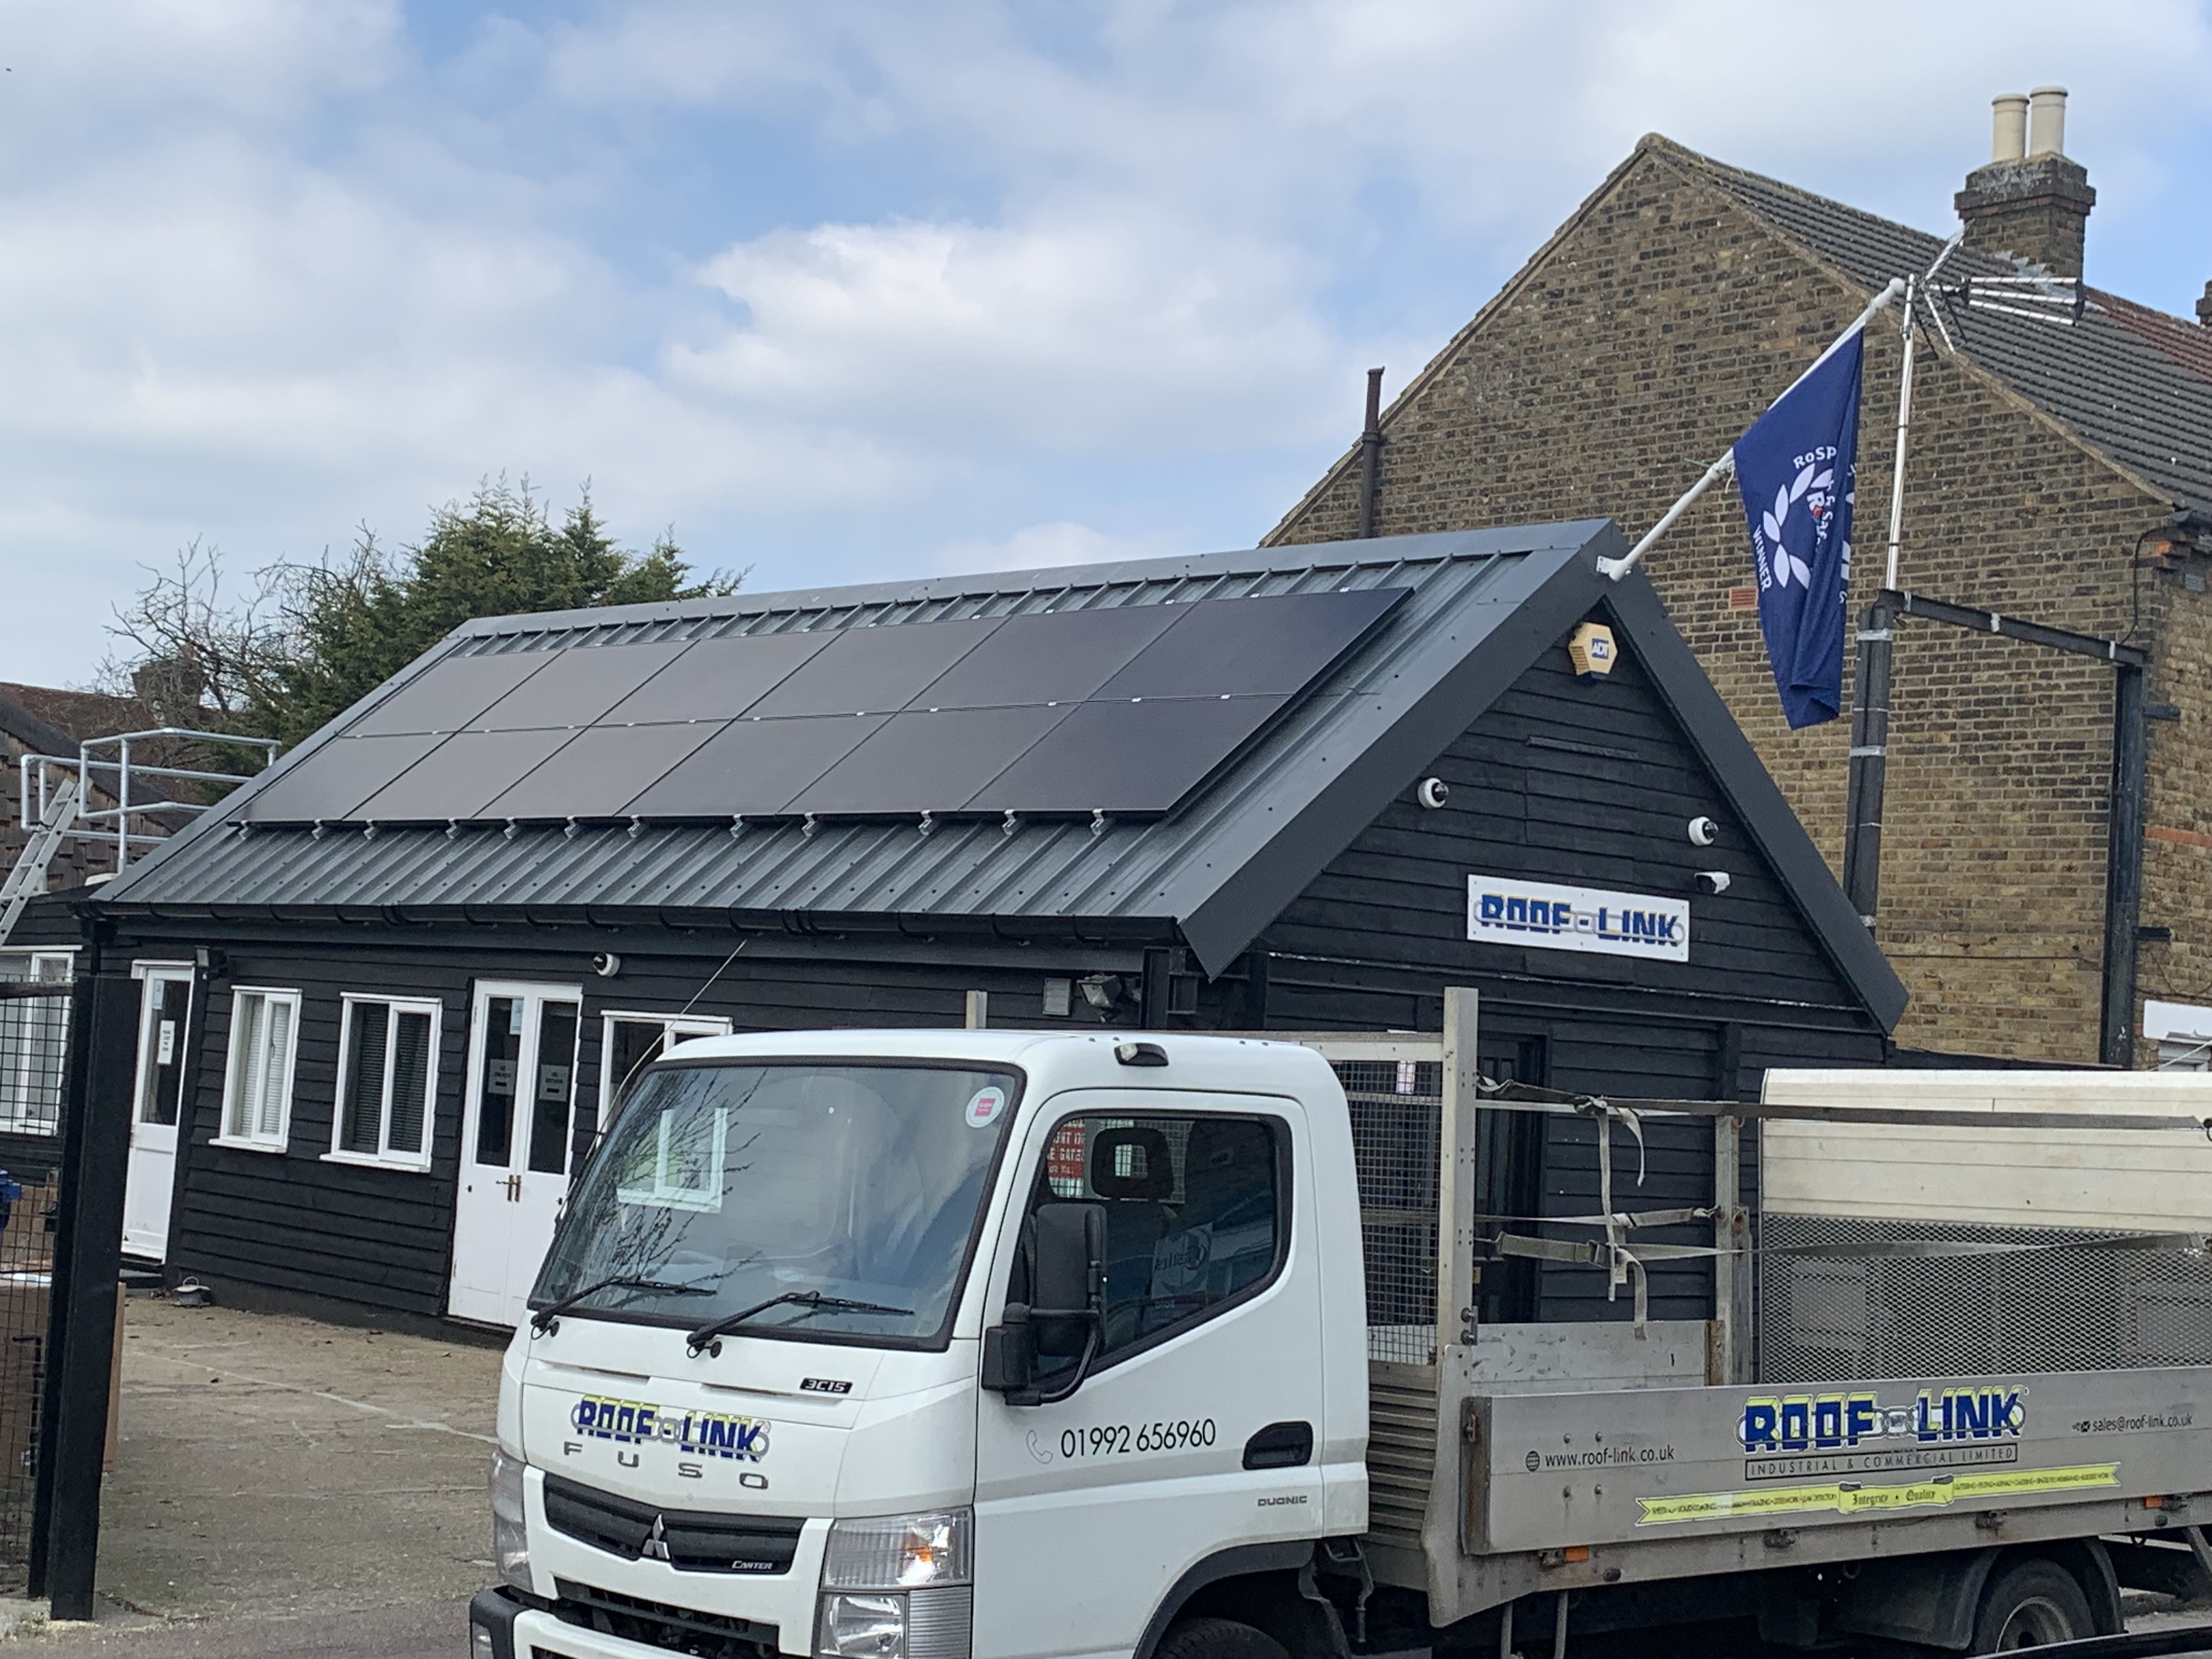 Solar Panels/Tesla Powerwall/Air Source Heat Pump     Roof Link